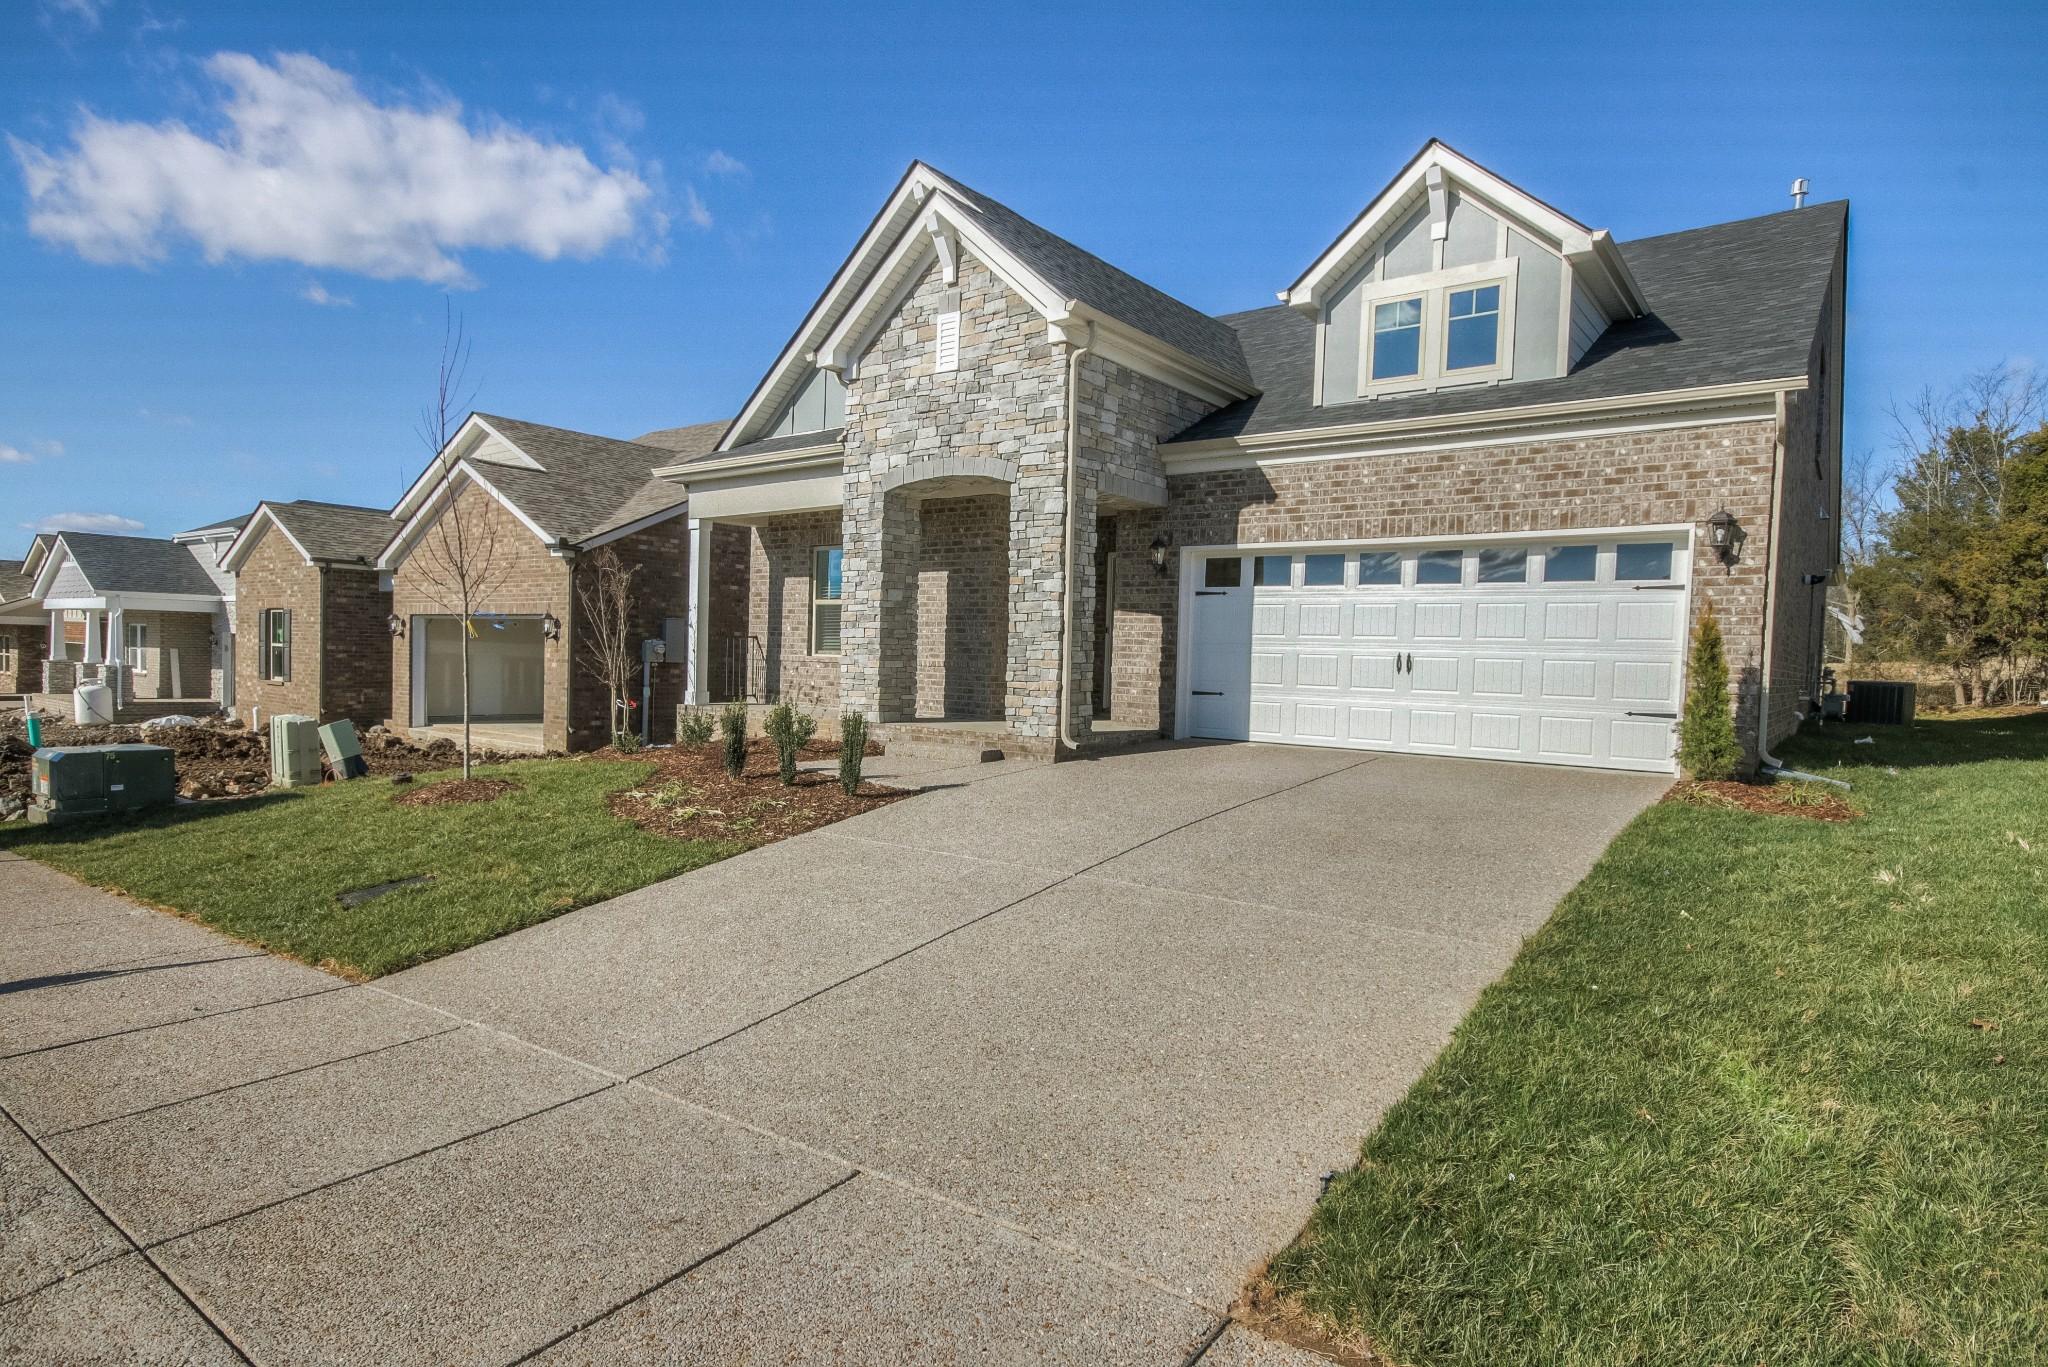 4953 Riverbank Dr, Hermitage, TN 37076 - Hermitage, TN real estate listing